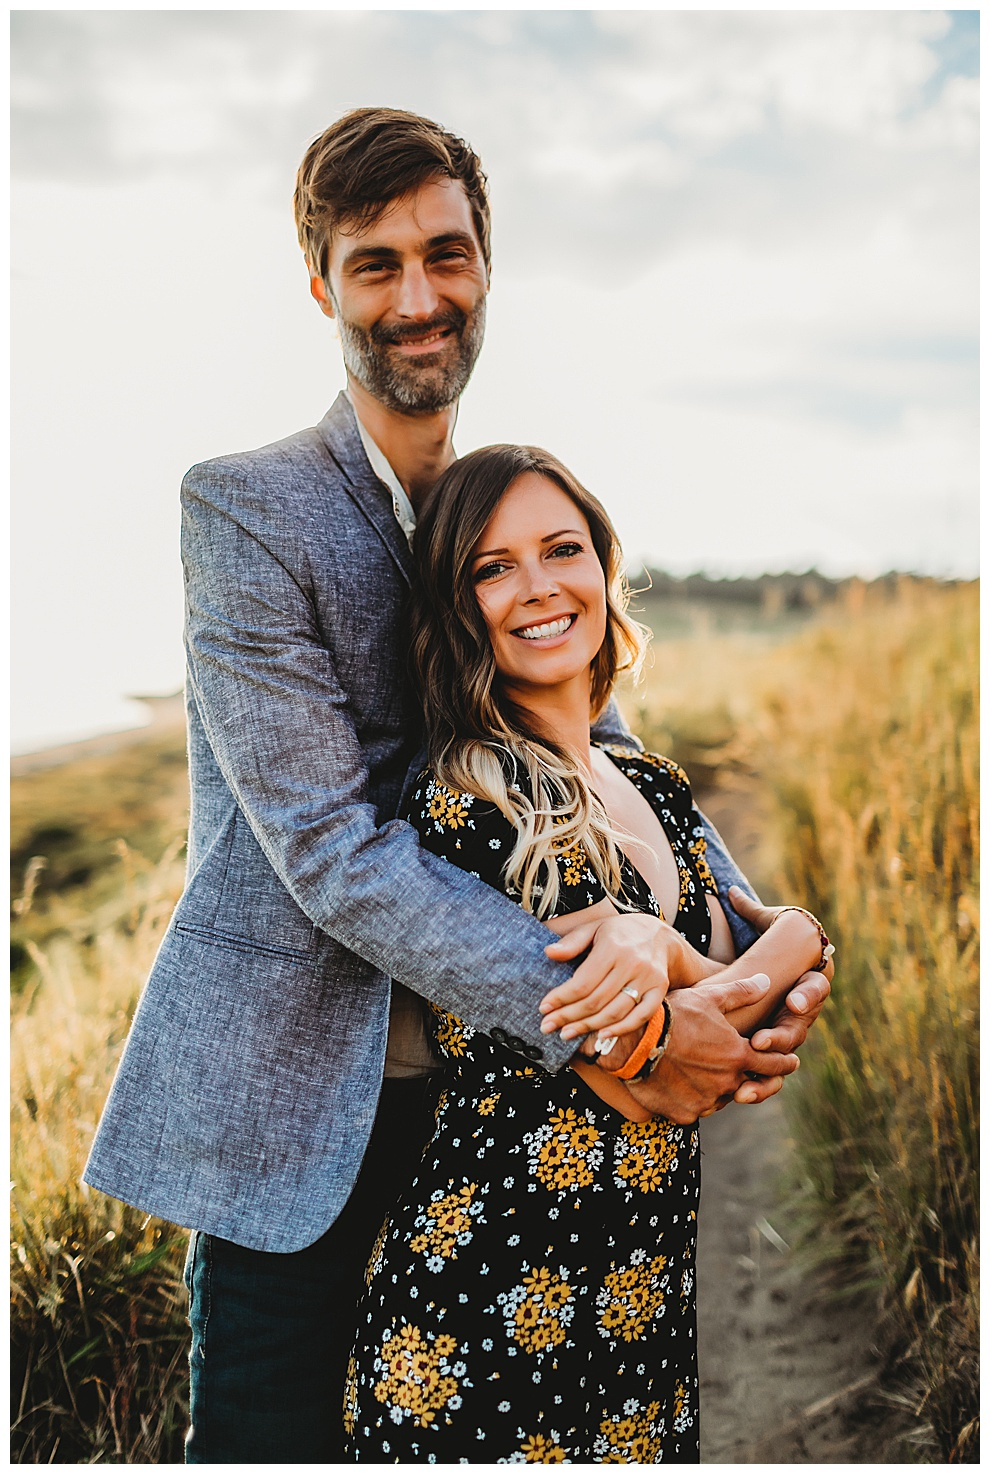 man wraps arms around woman